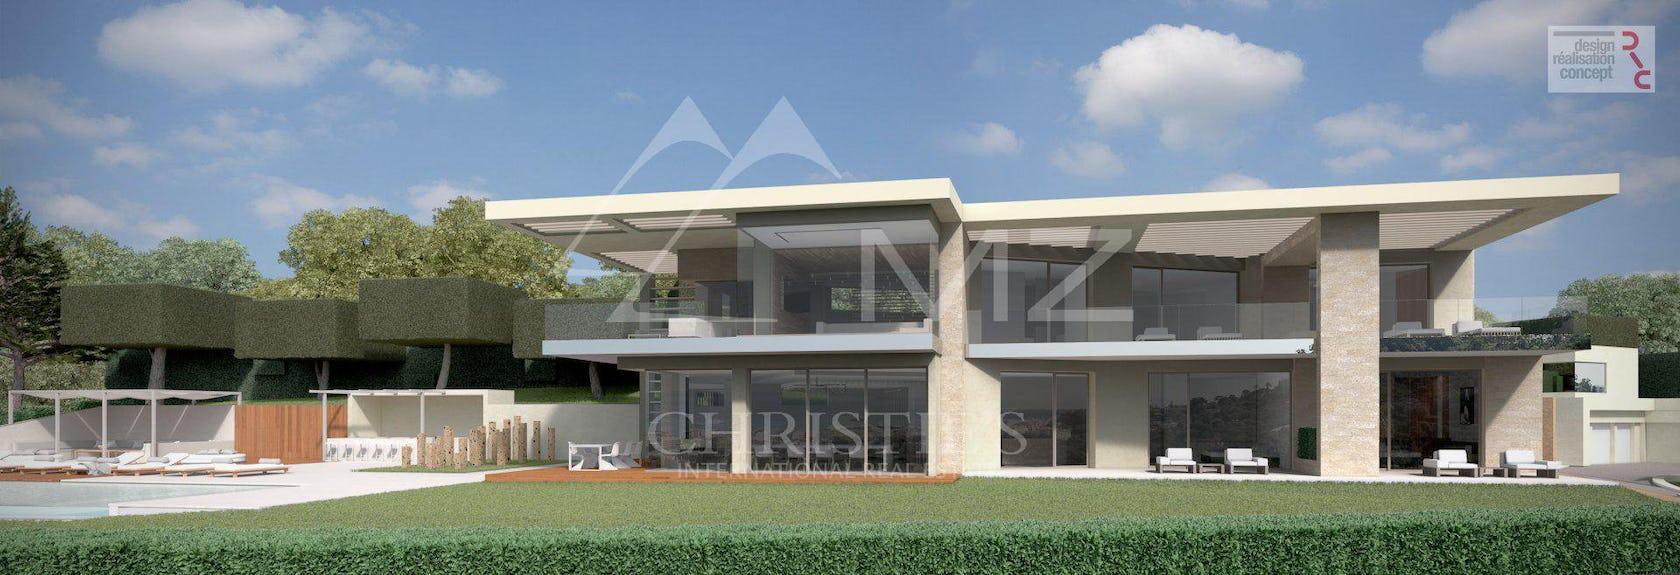 grass plant building lawn architecture